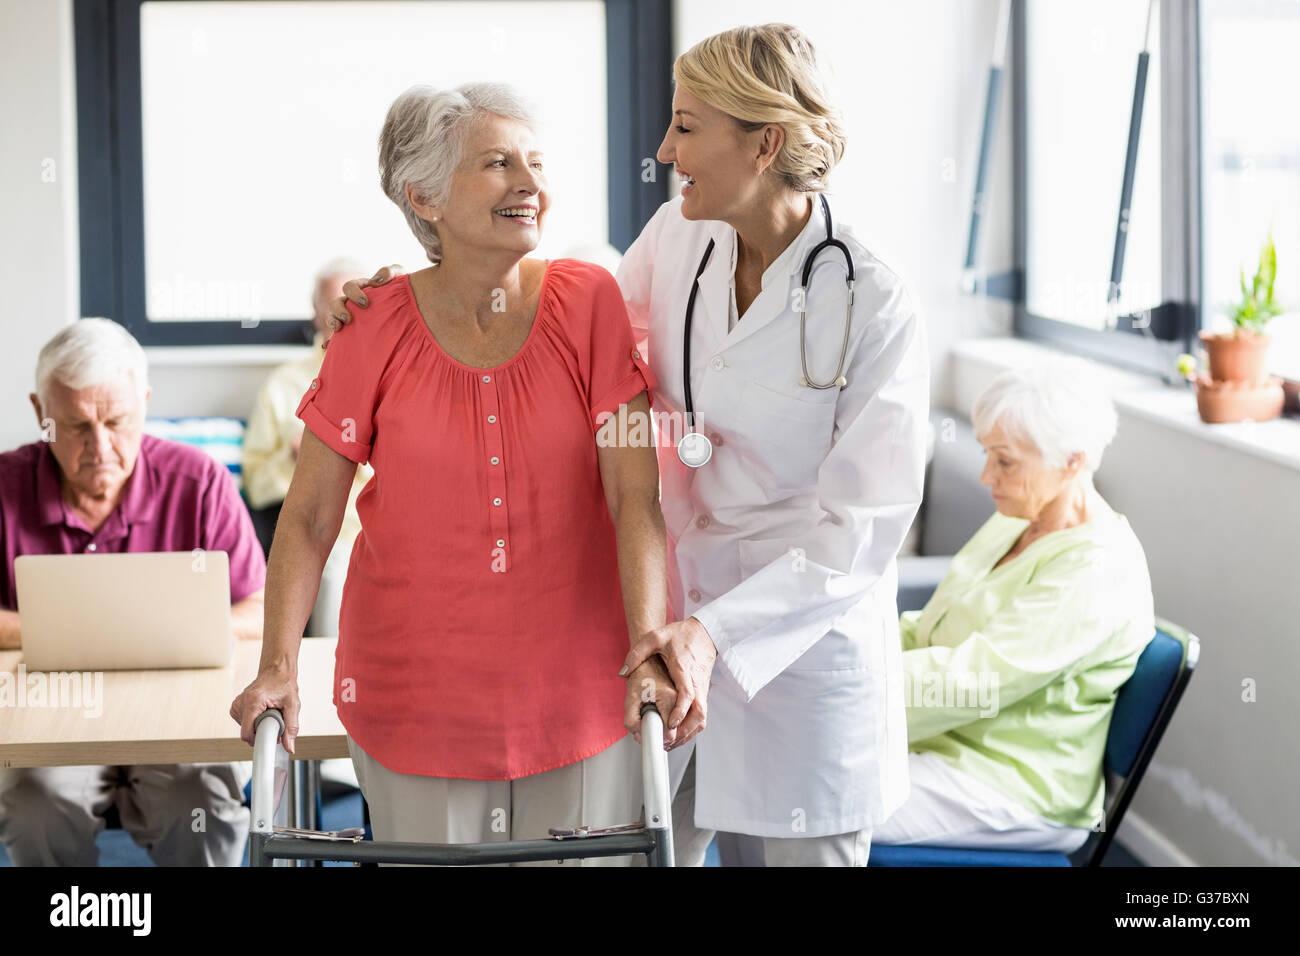 Nurse helping senior with walking aid - Stock Image